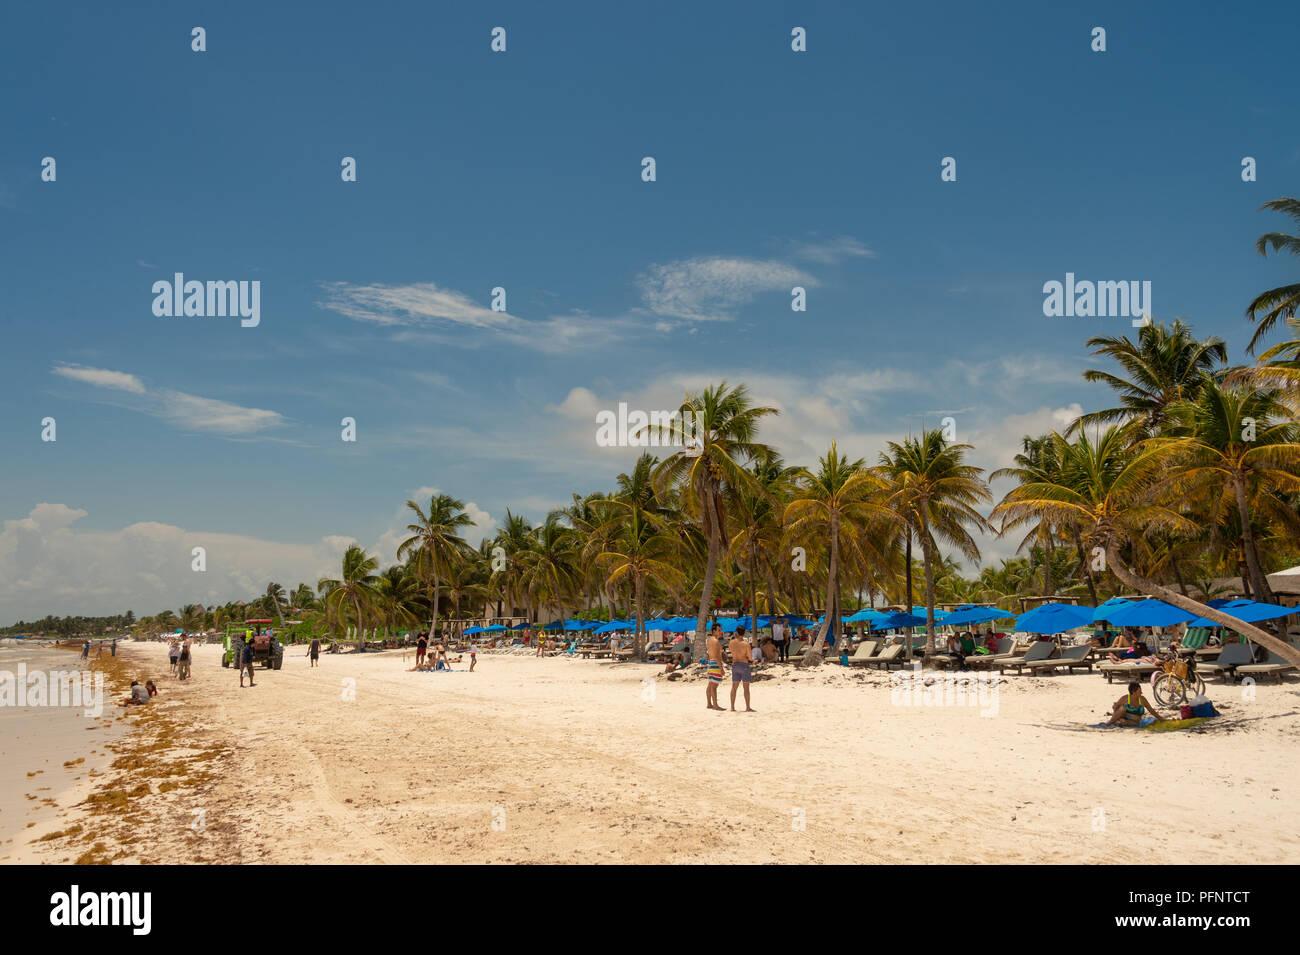 Tulum, México - 12 de agosto de 2018: Vista de Playa Paraiso Playa cerca de Tulum. Imagen De Stock